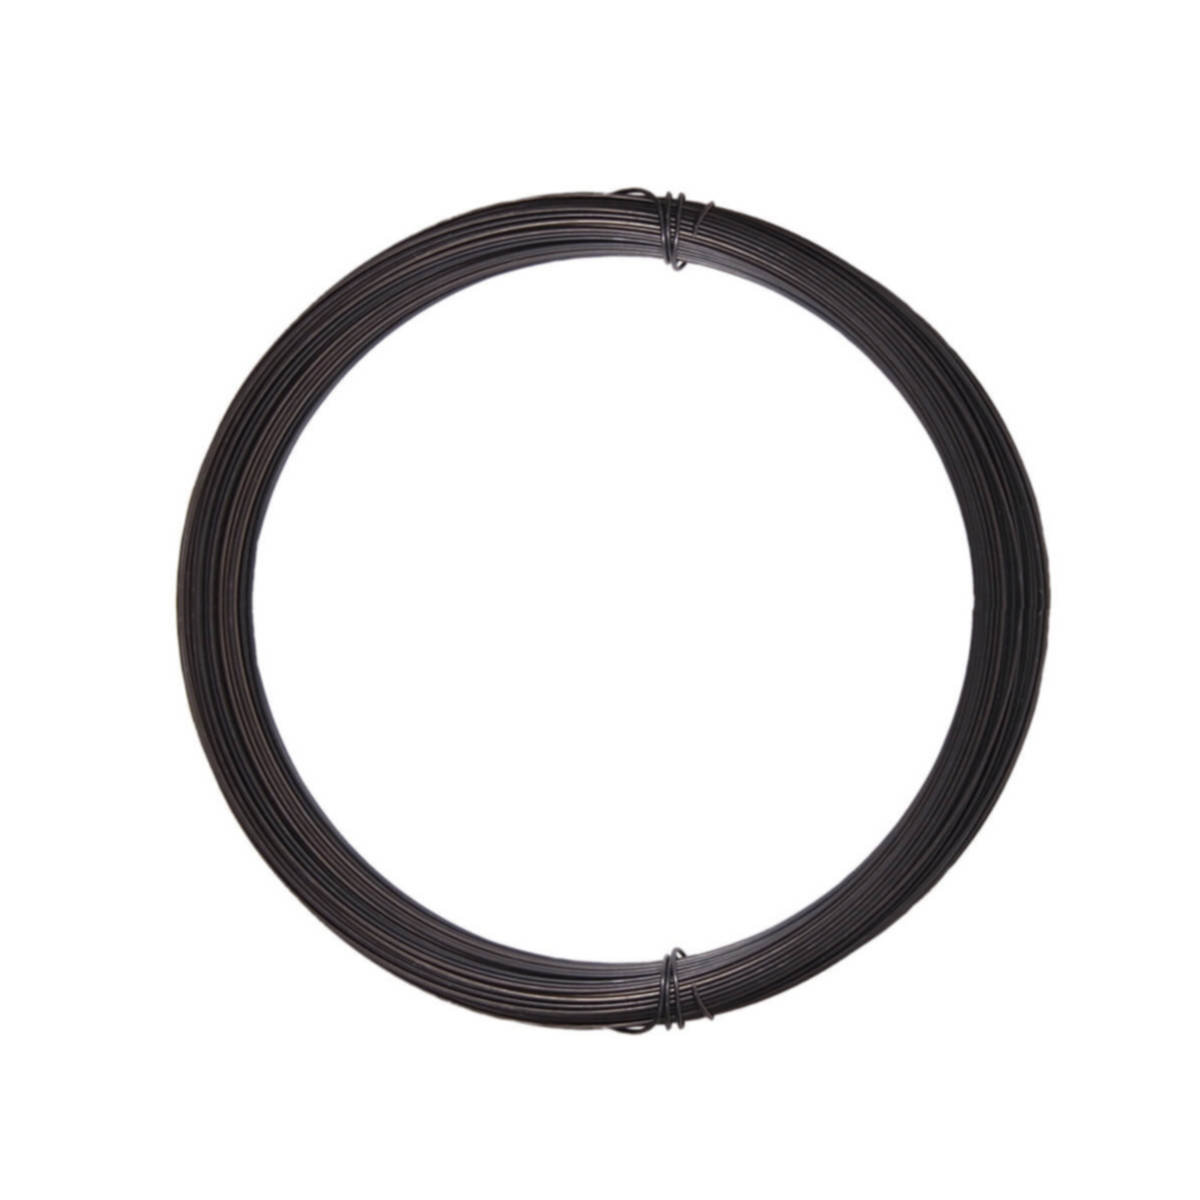 Ben-Mor Cables 93068